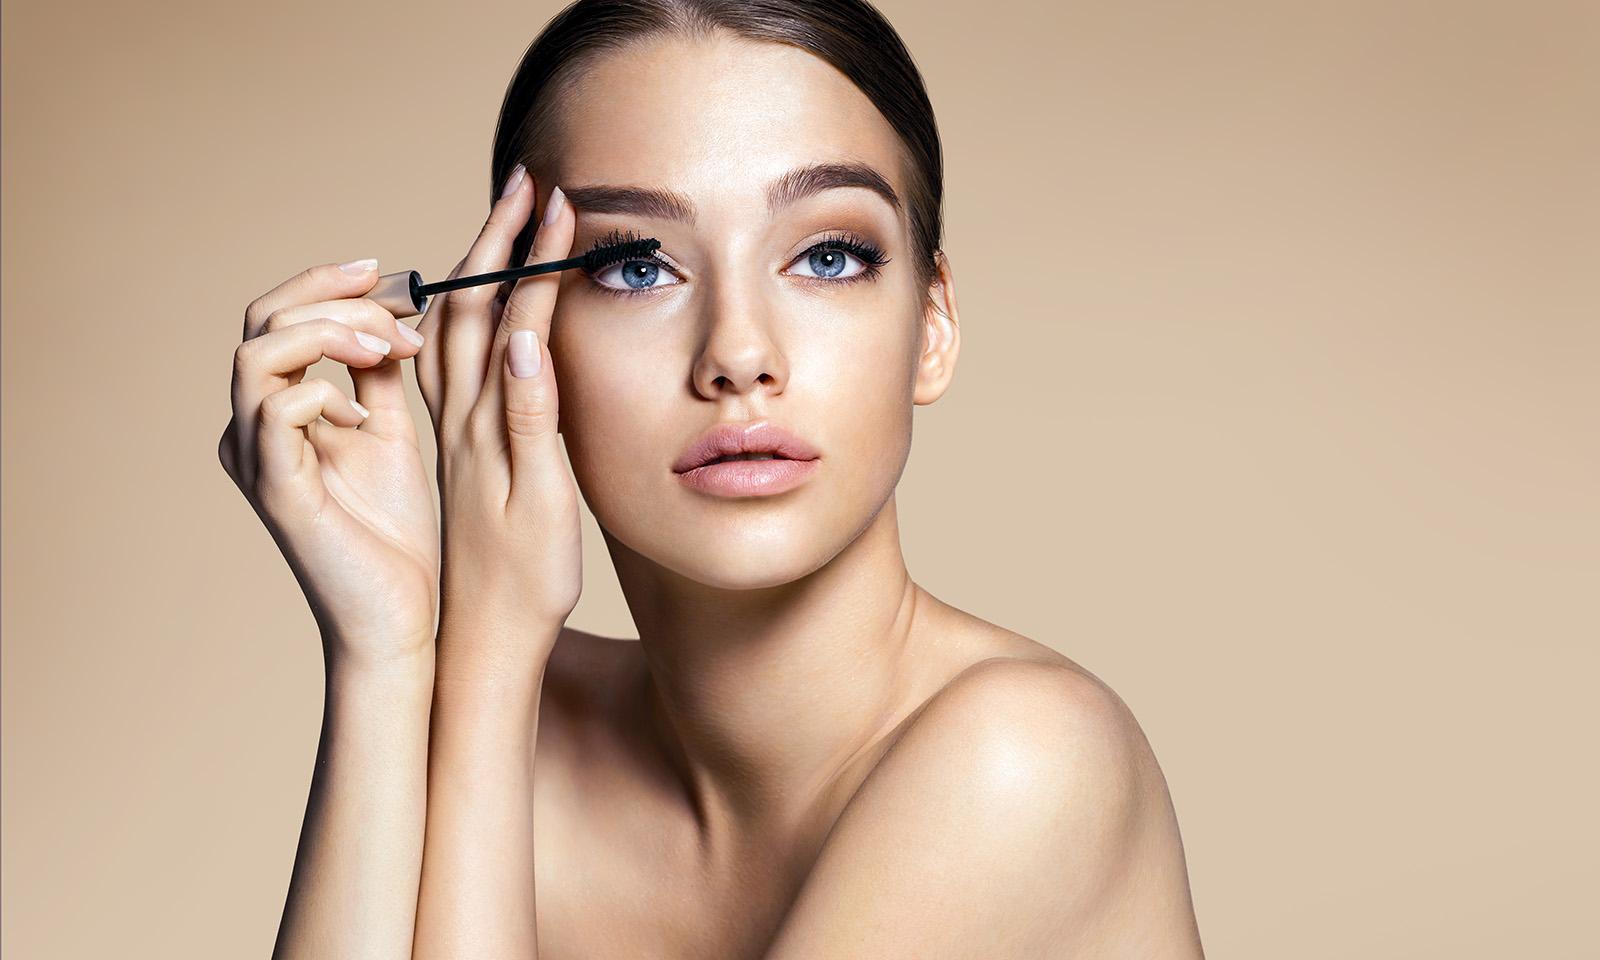 ethical-guide-to-false-lashes-woman-applying-mascara-main-image